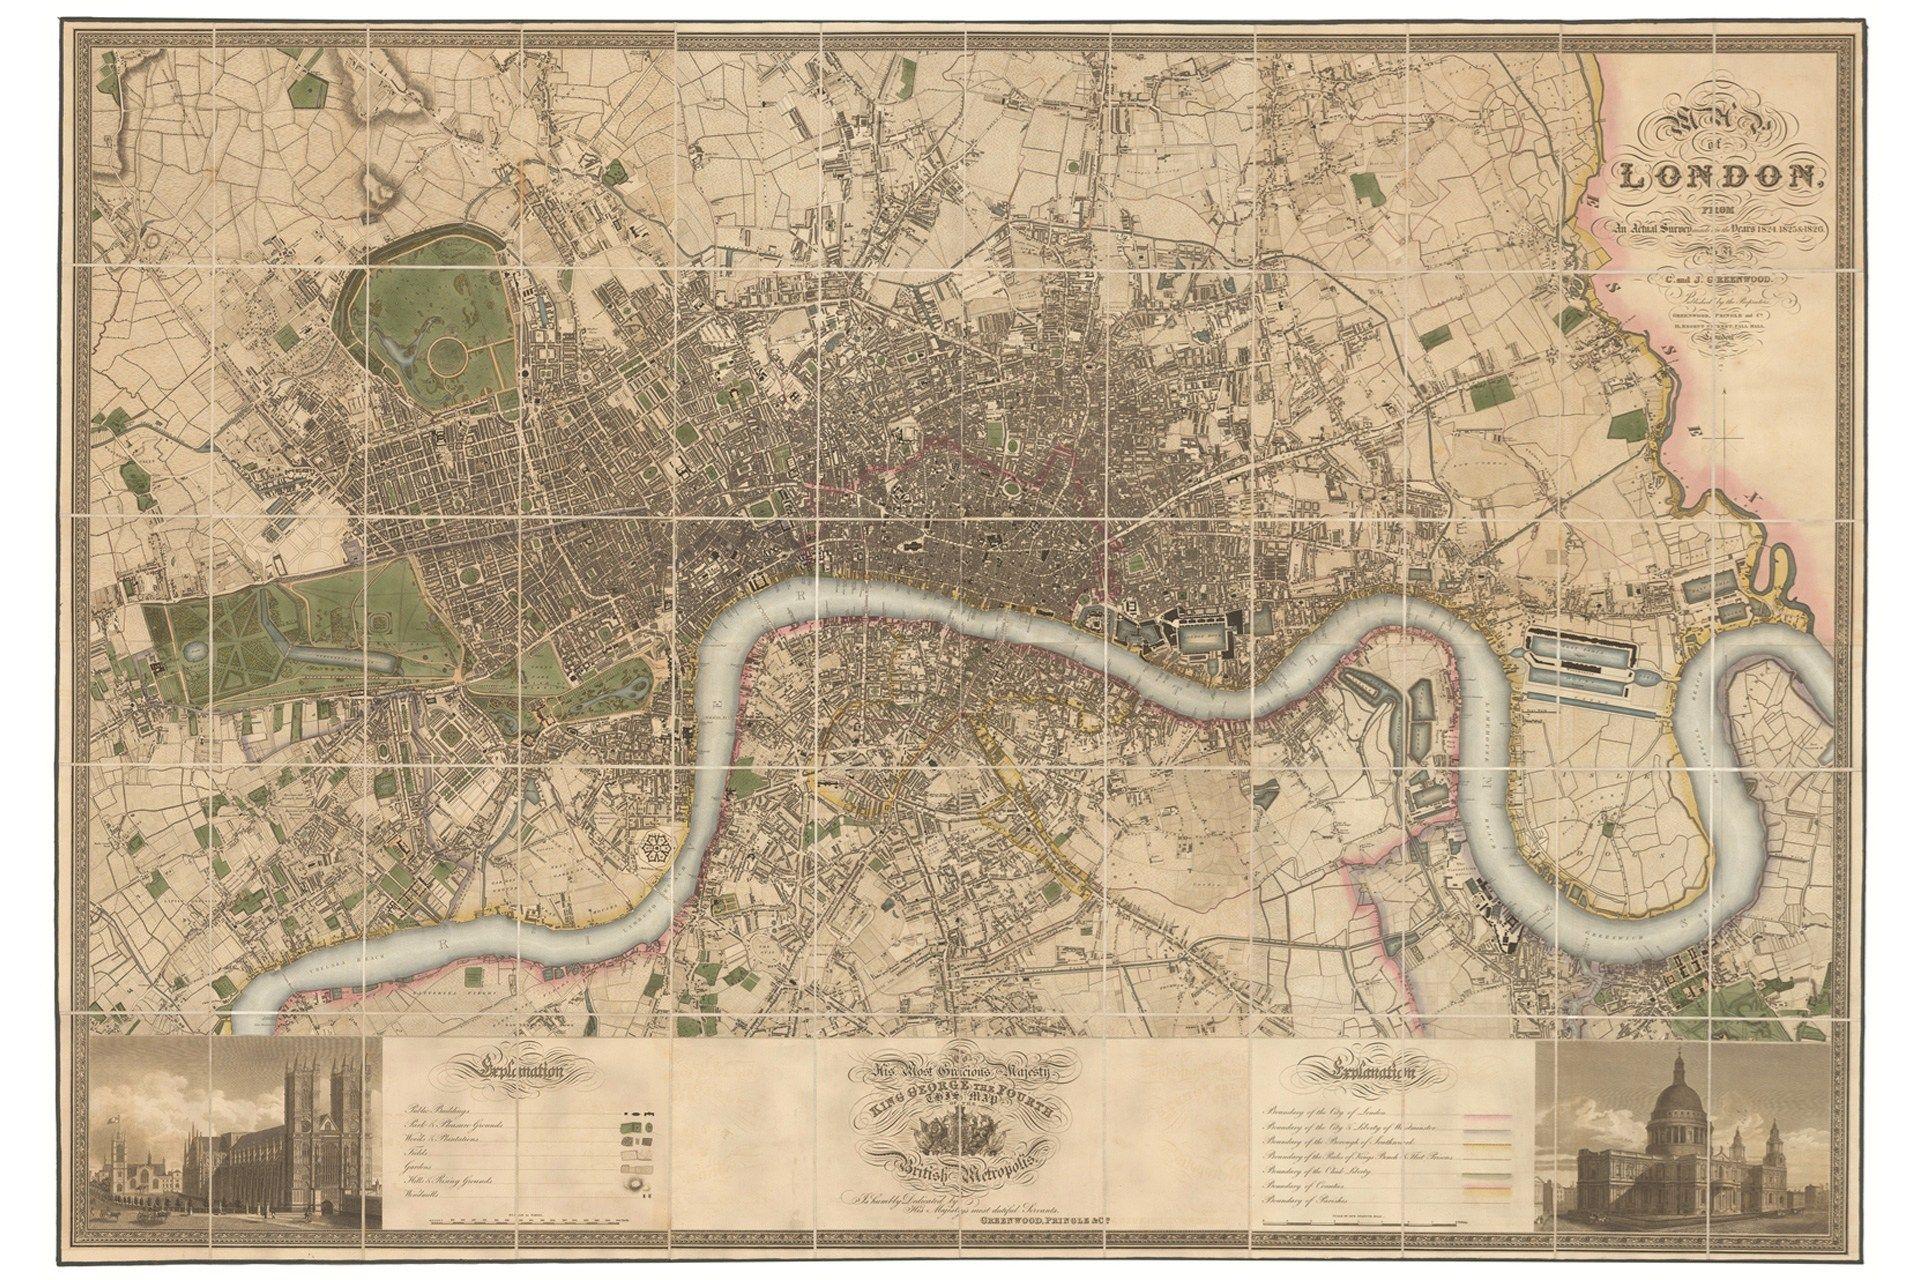 Greenwoodu0027s Map of London 1827 Greenwoodu0027s Map